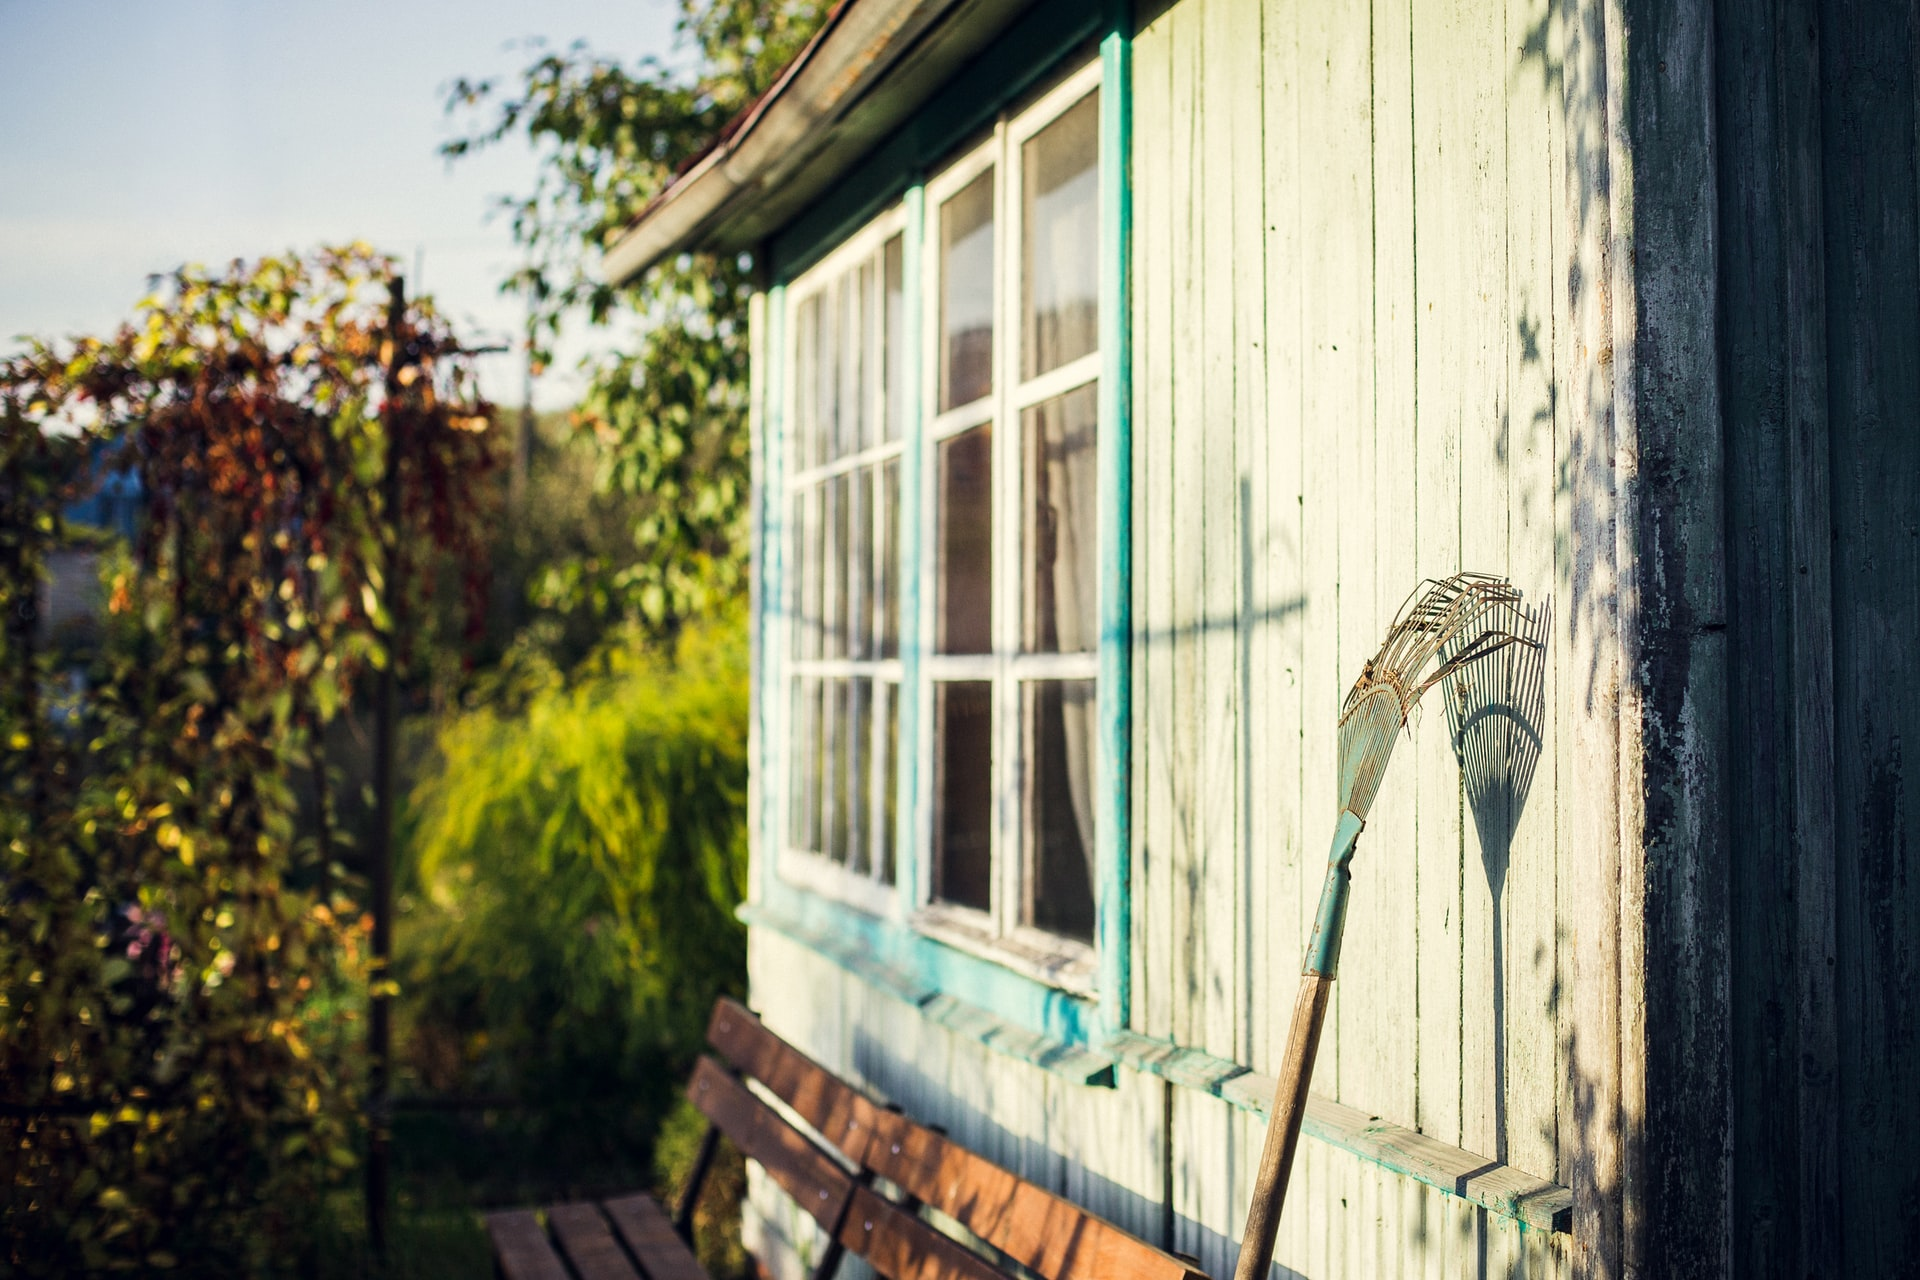 Garden shed window in the sunlight